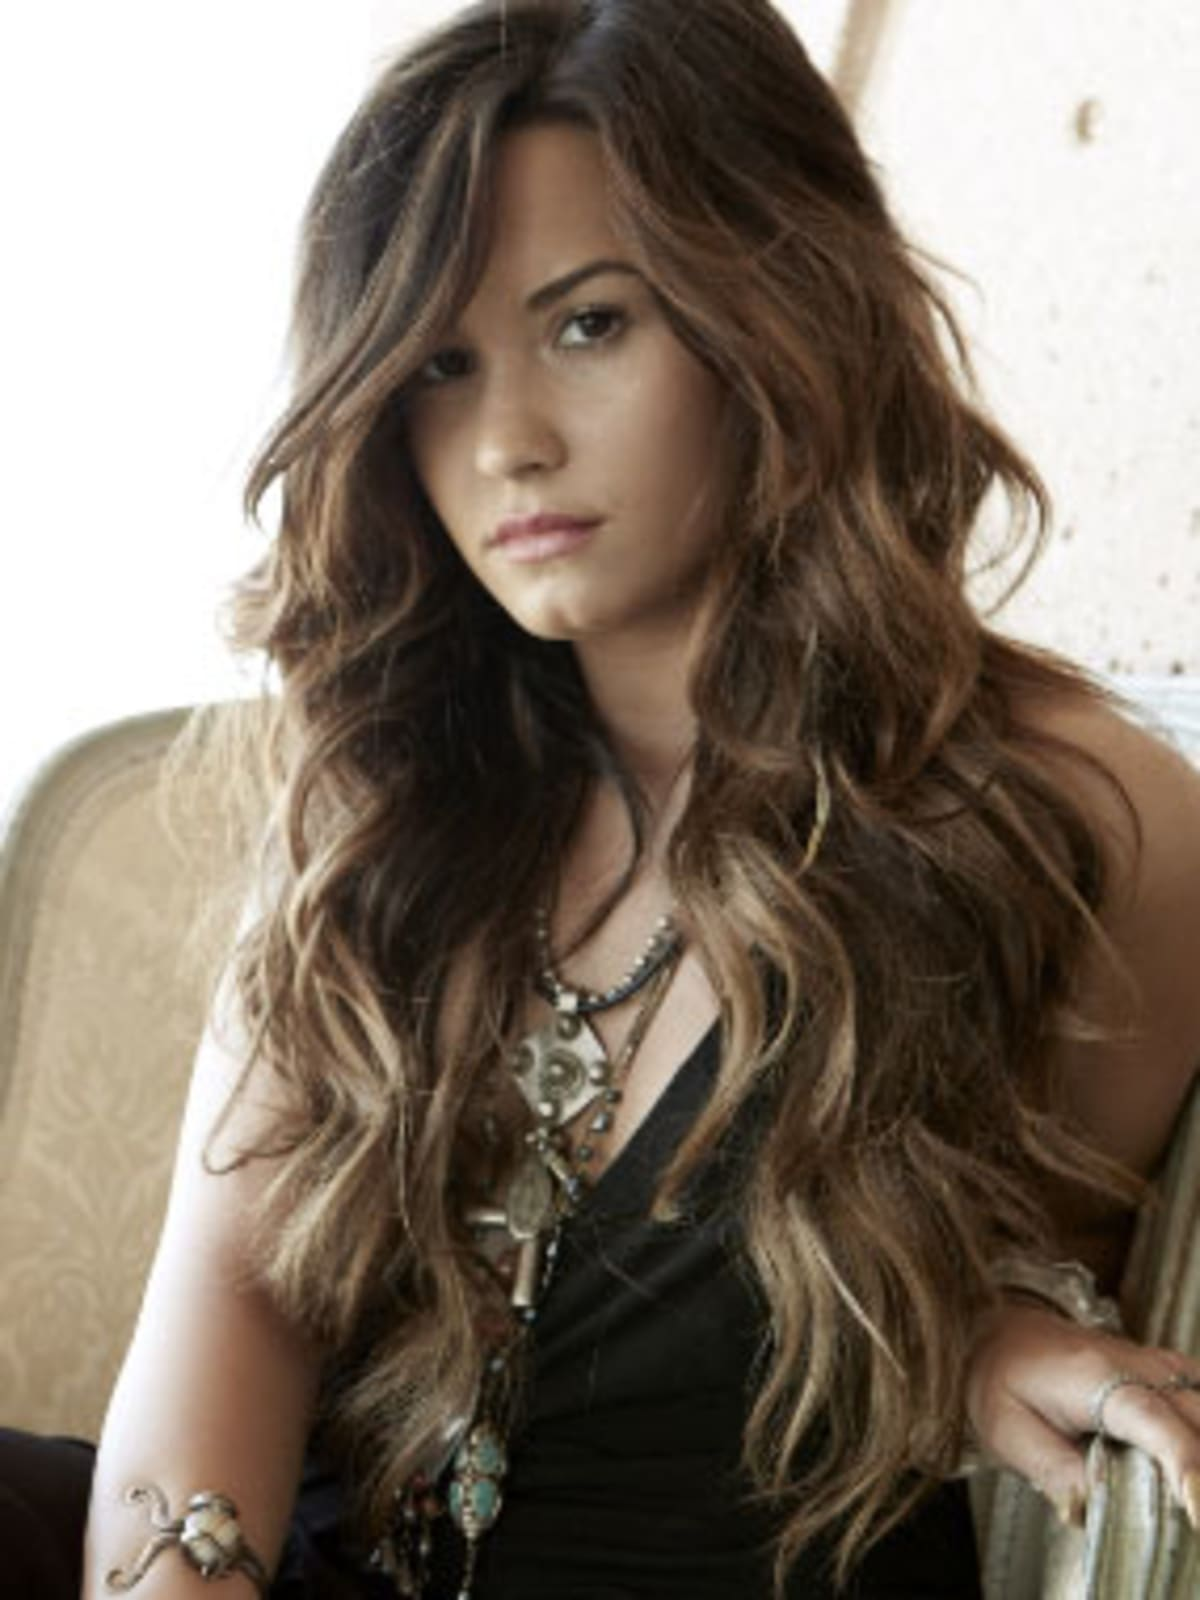 RodeoHouston 2013 Concert: Demi Lovato